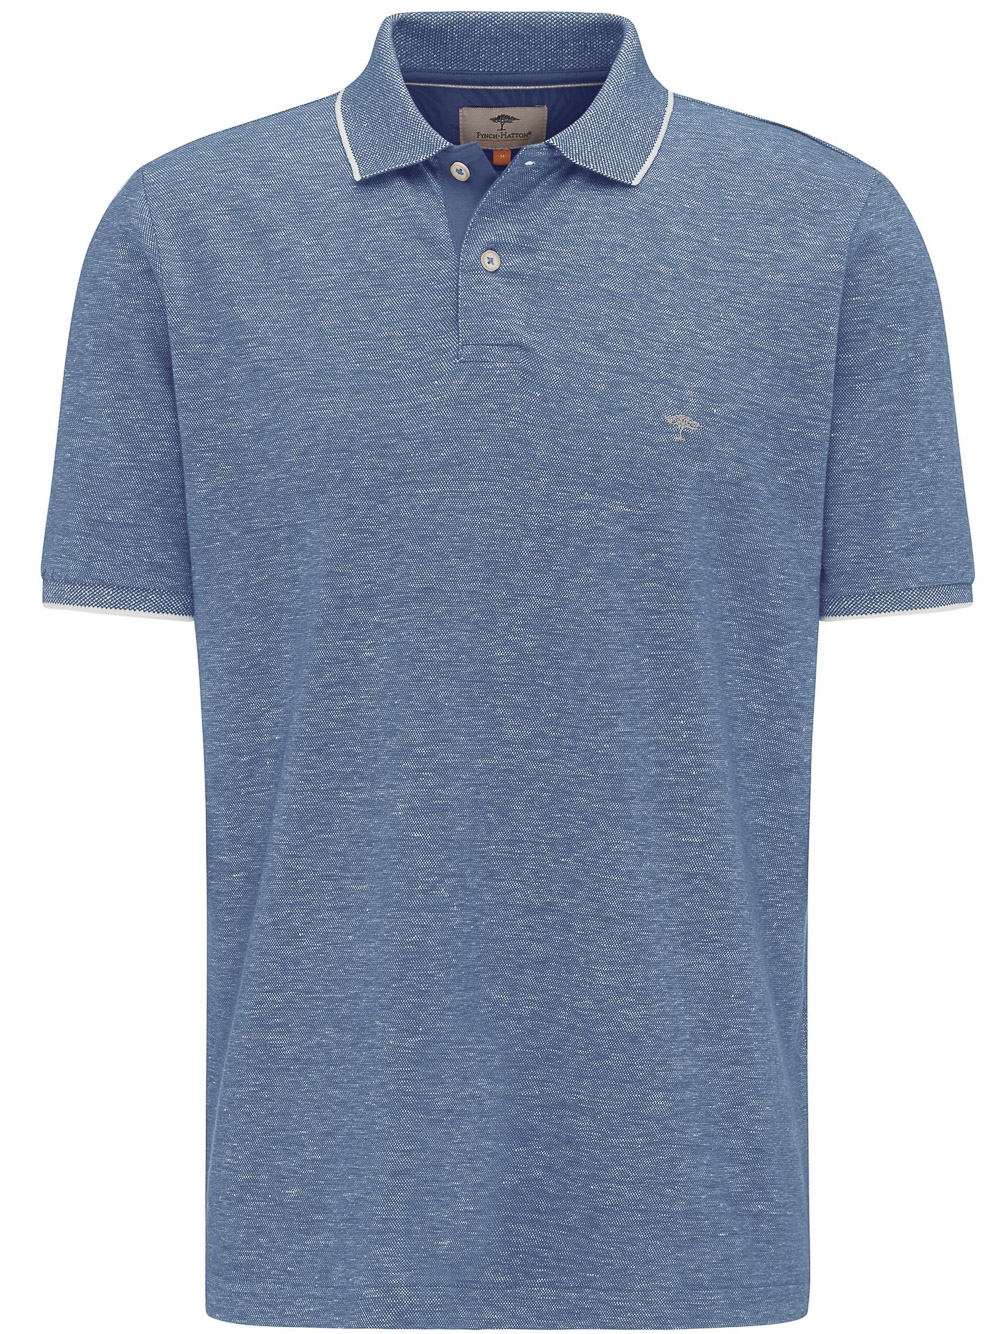 FYNCH-HATTON Μπλούζα Polo 1120 1790-1509 ΣΙΕΛ